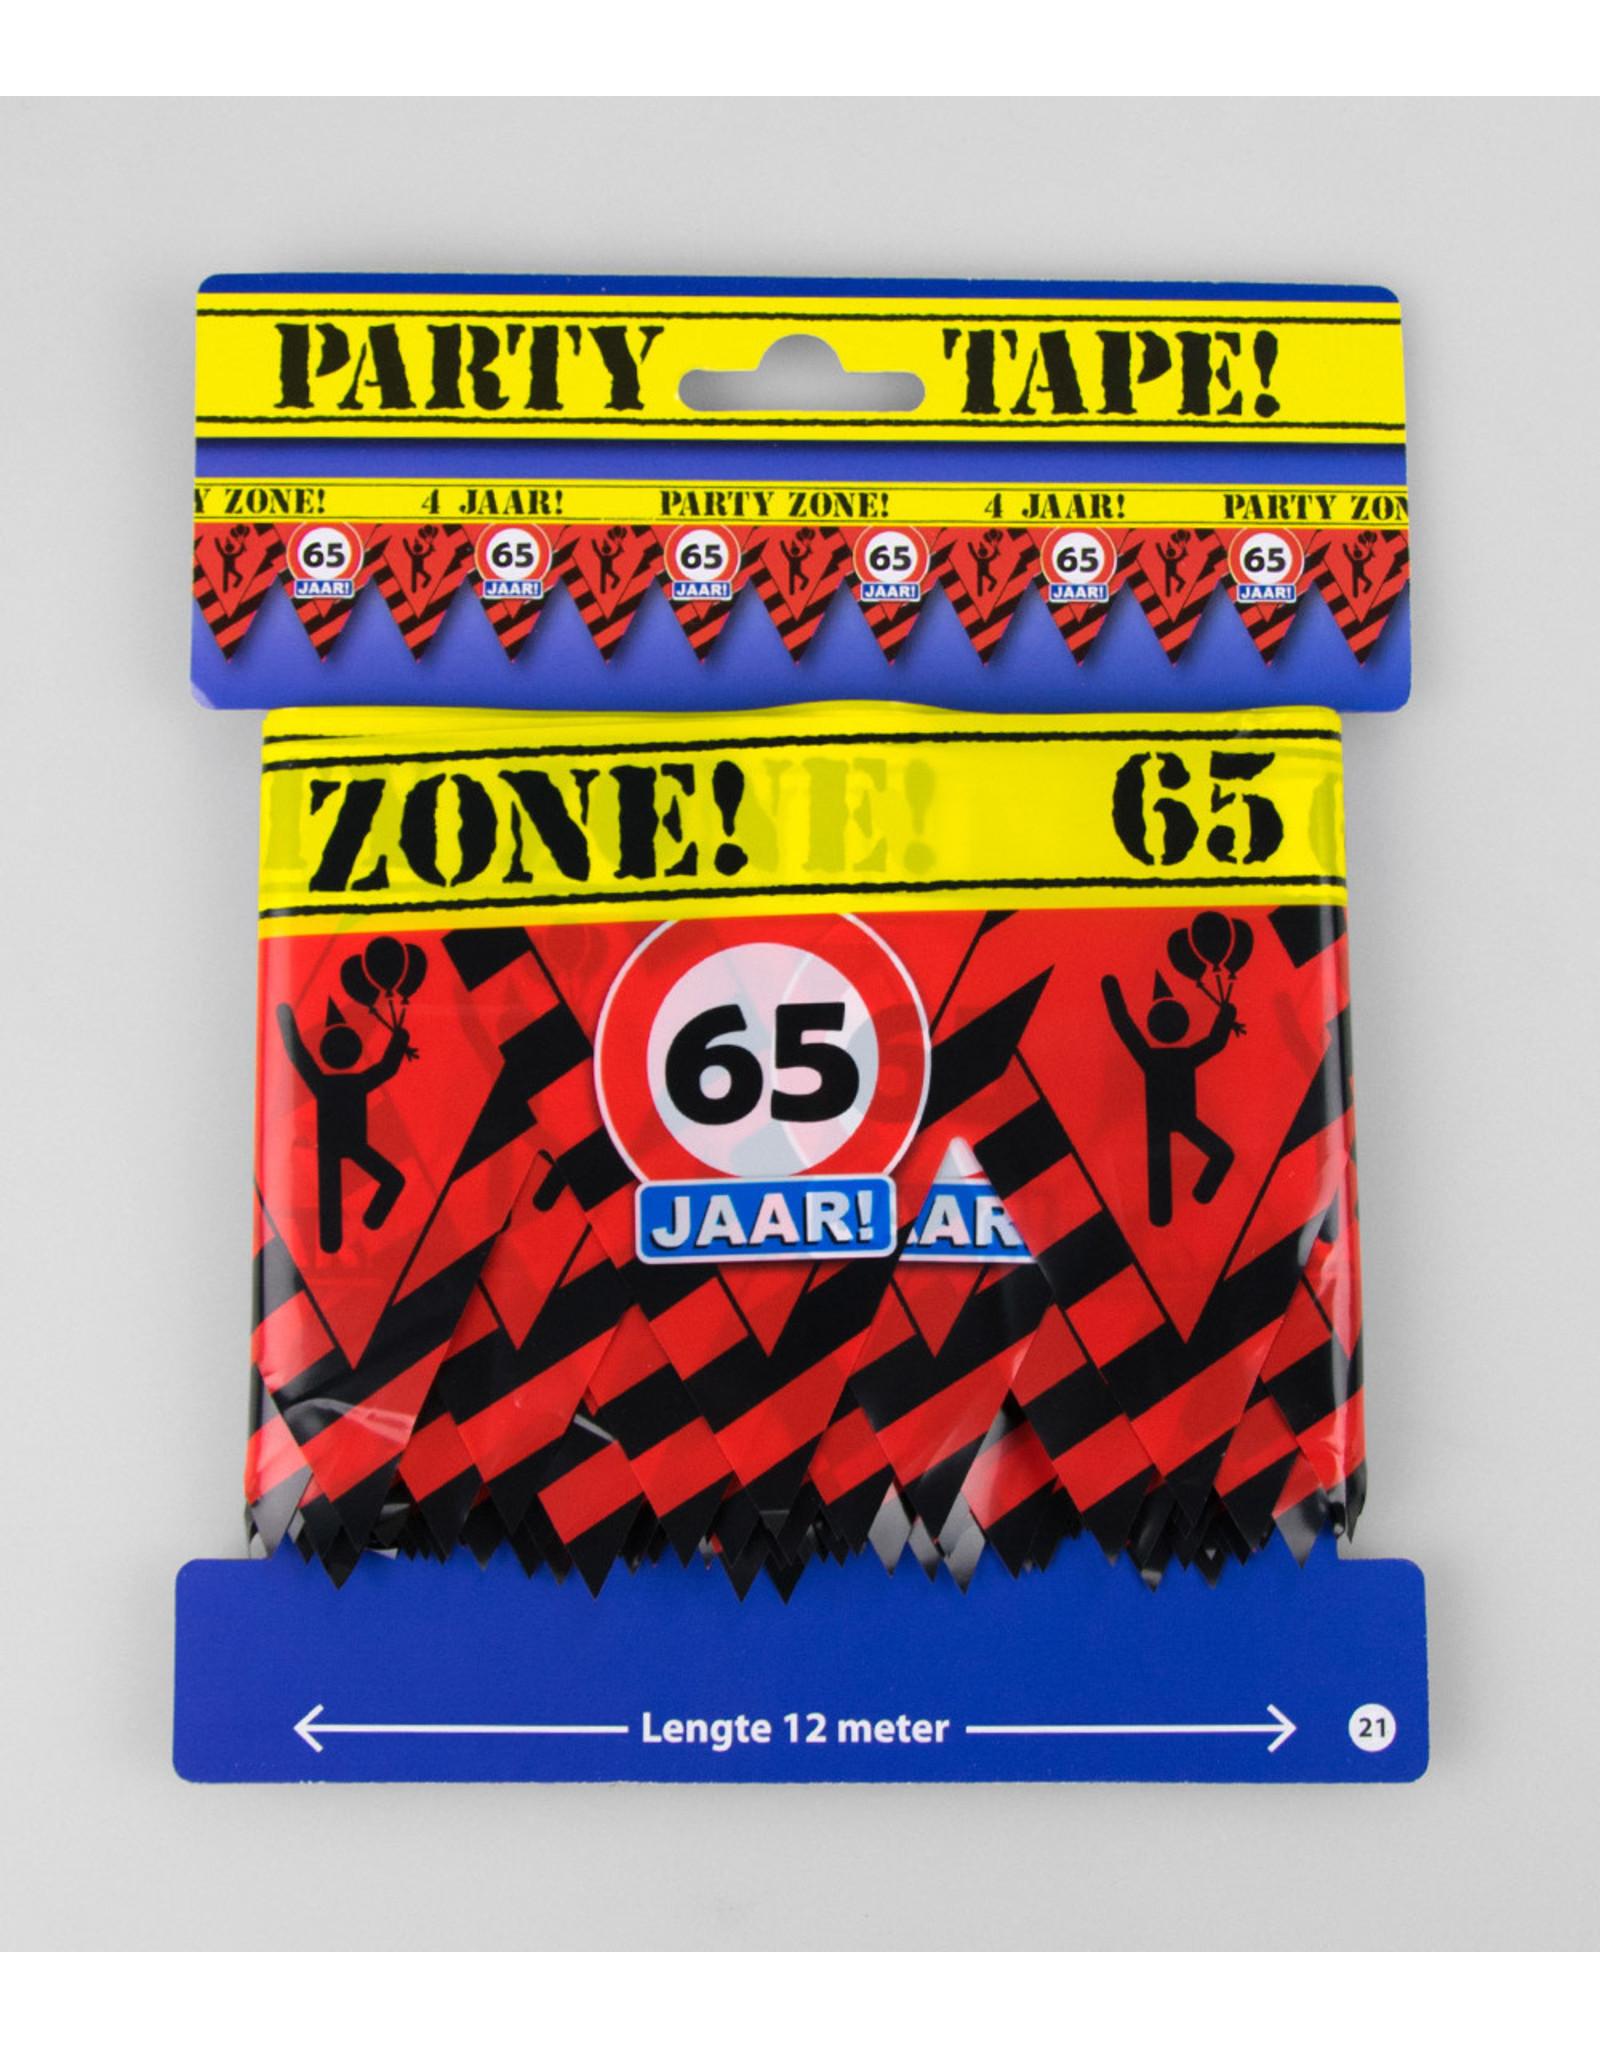 Afzetlint party zone 65 jaar